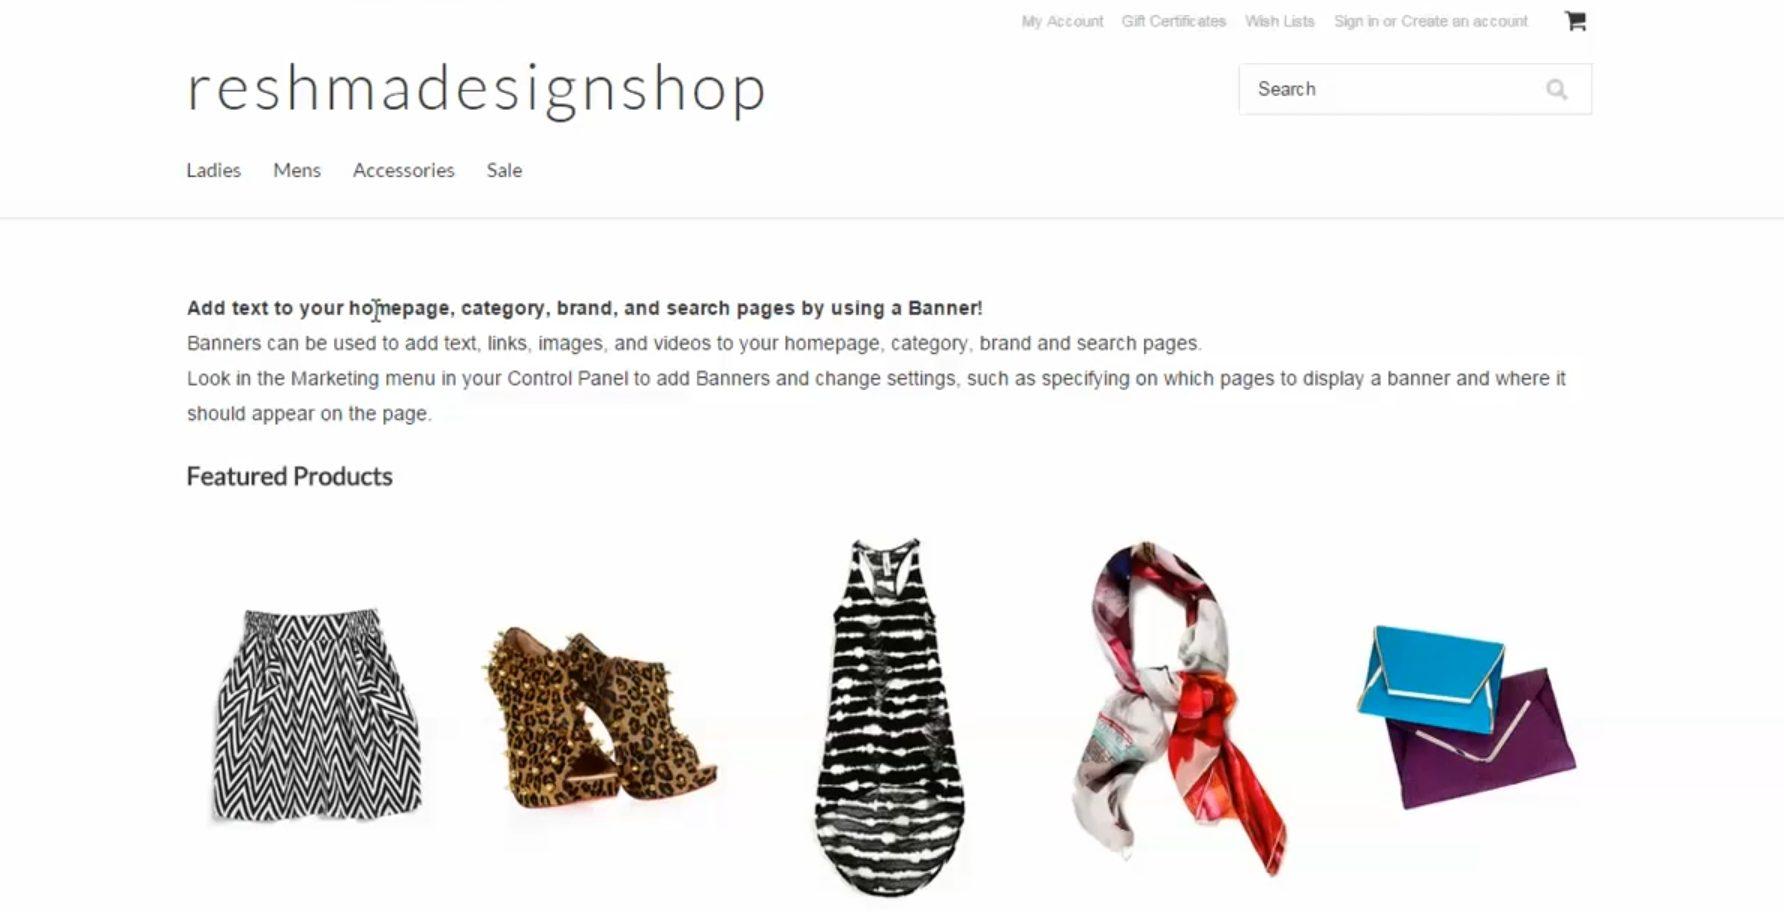 showcase your products using ecommerce apps like BigCommerce